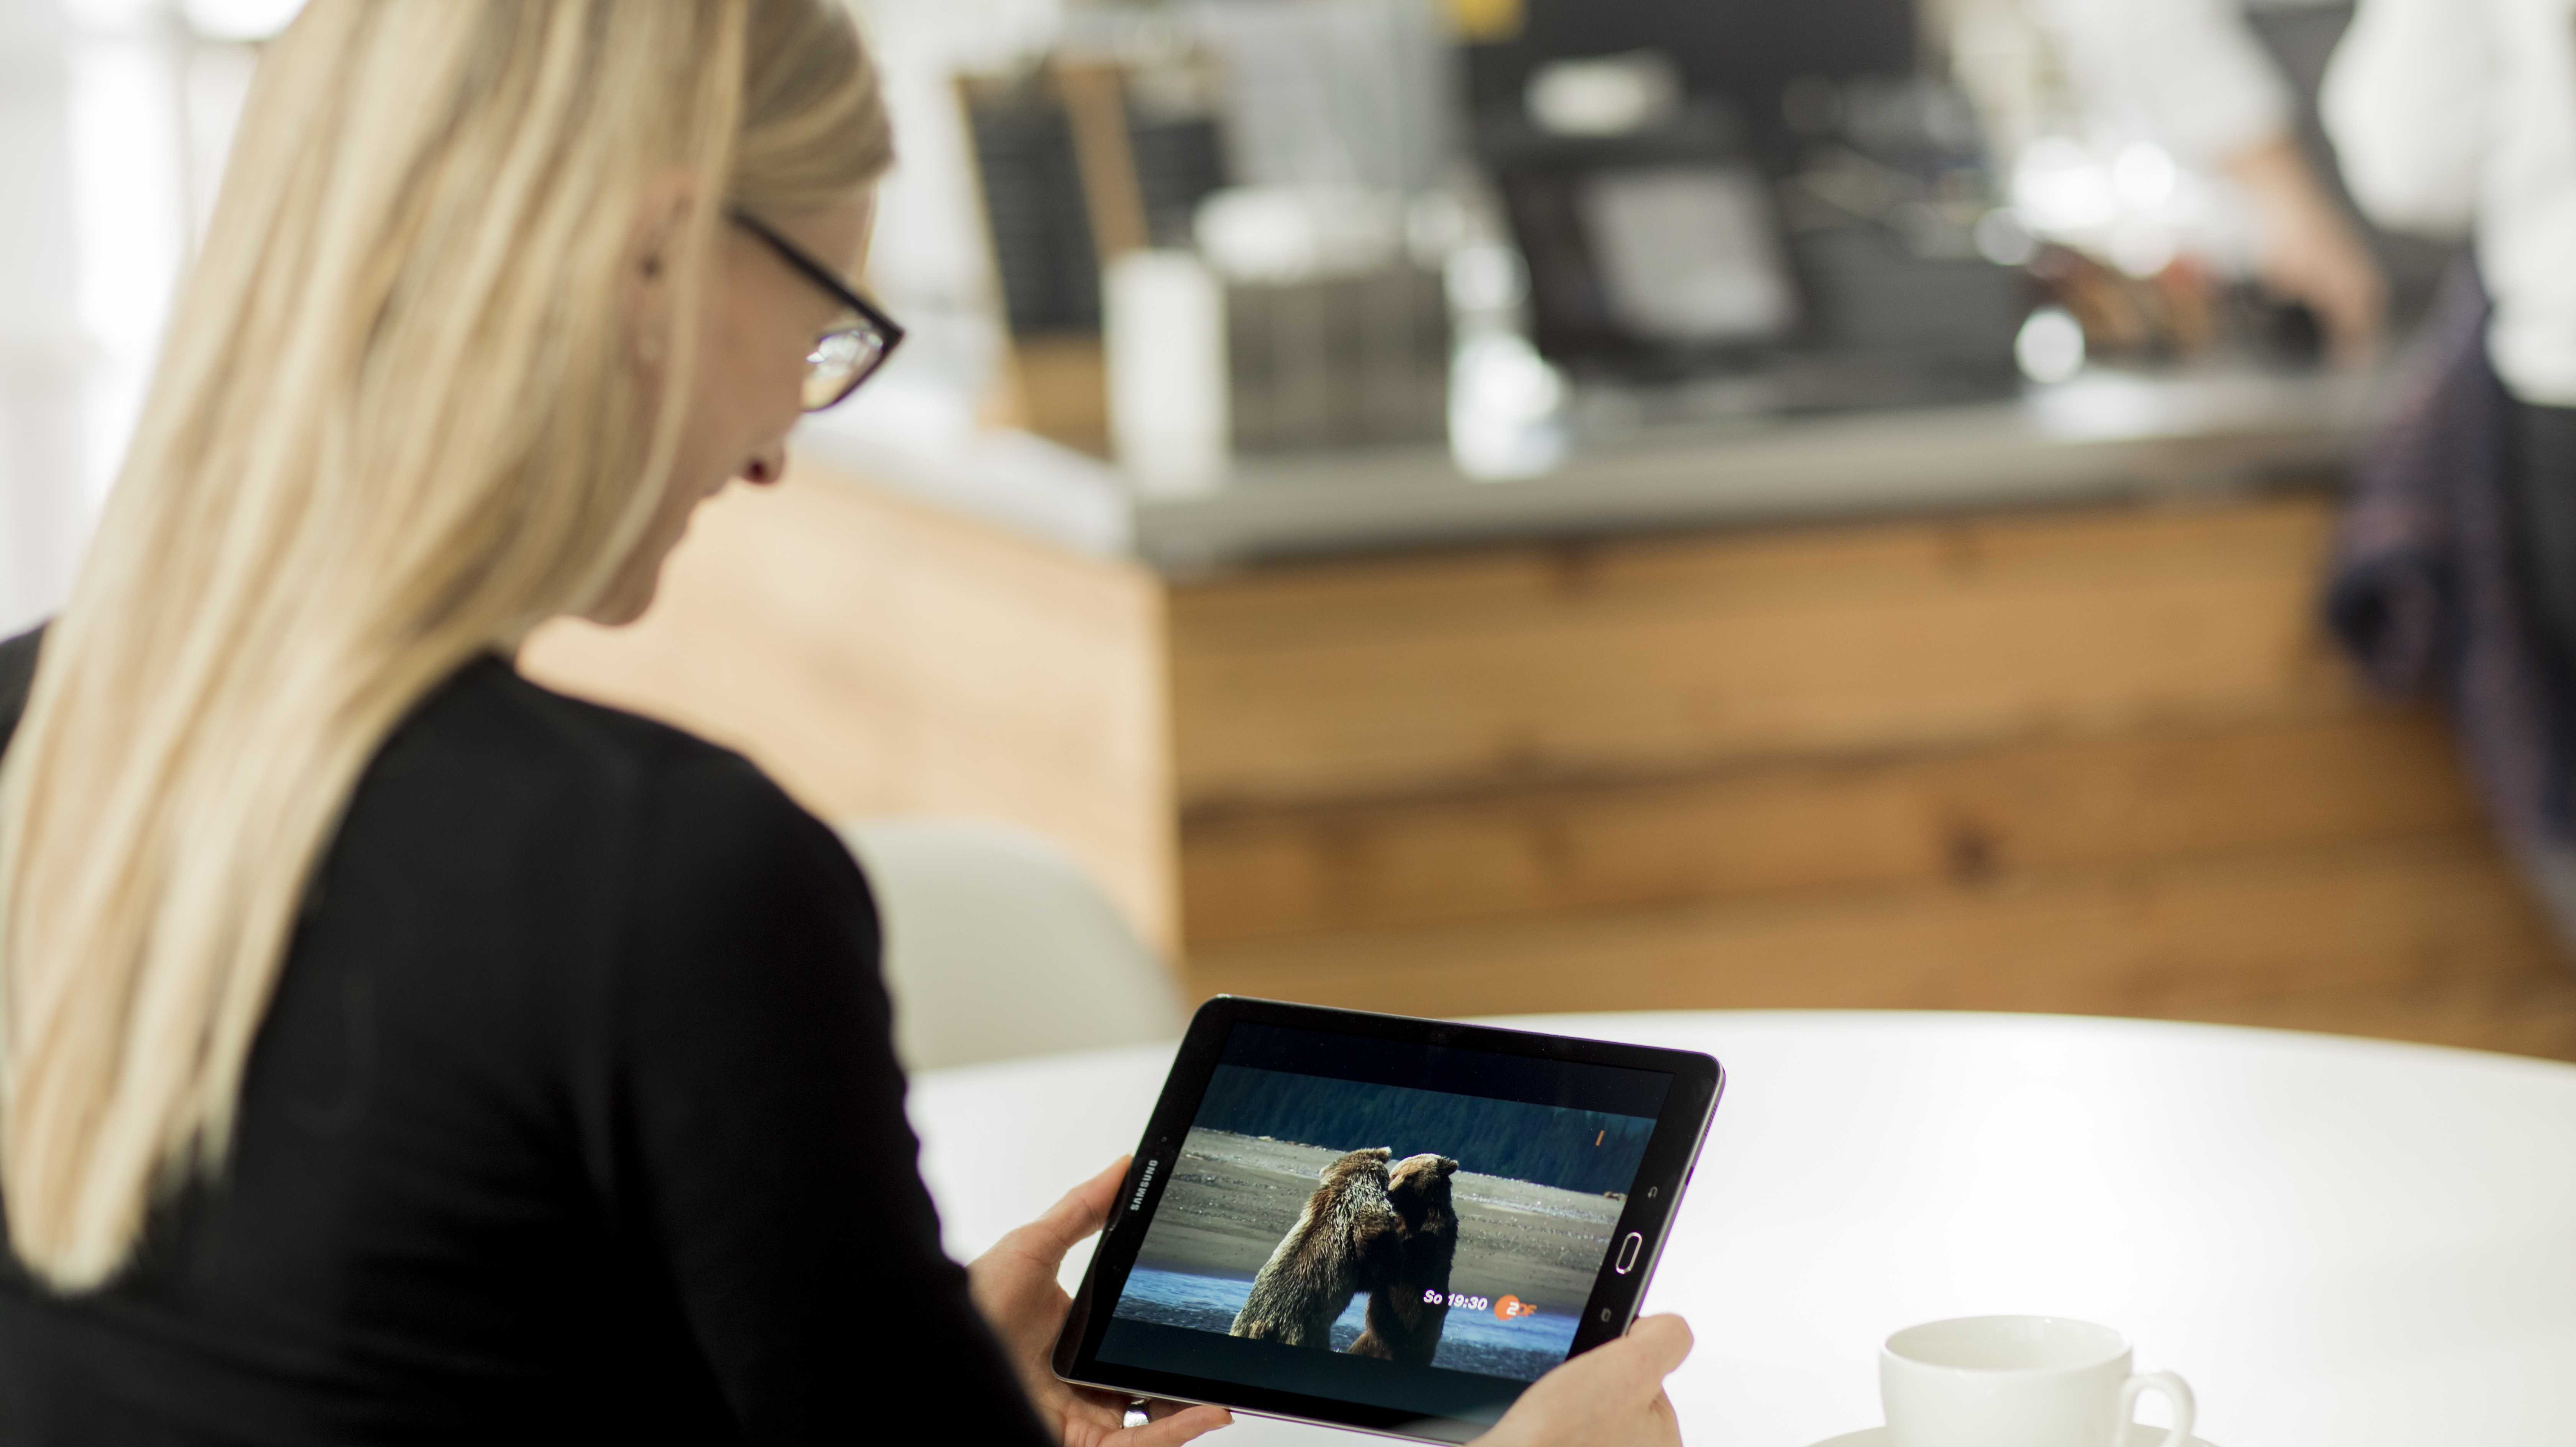 O2 TV: O2_Kunden bekommen WaipuTV vergünstigt